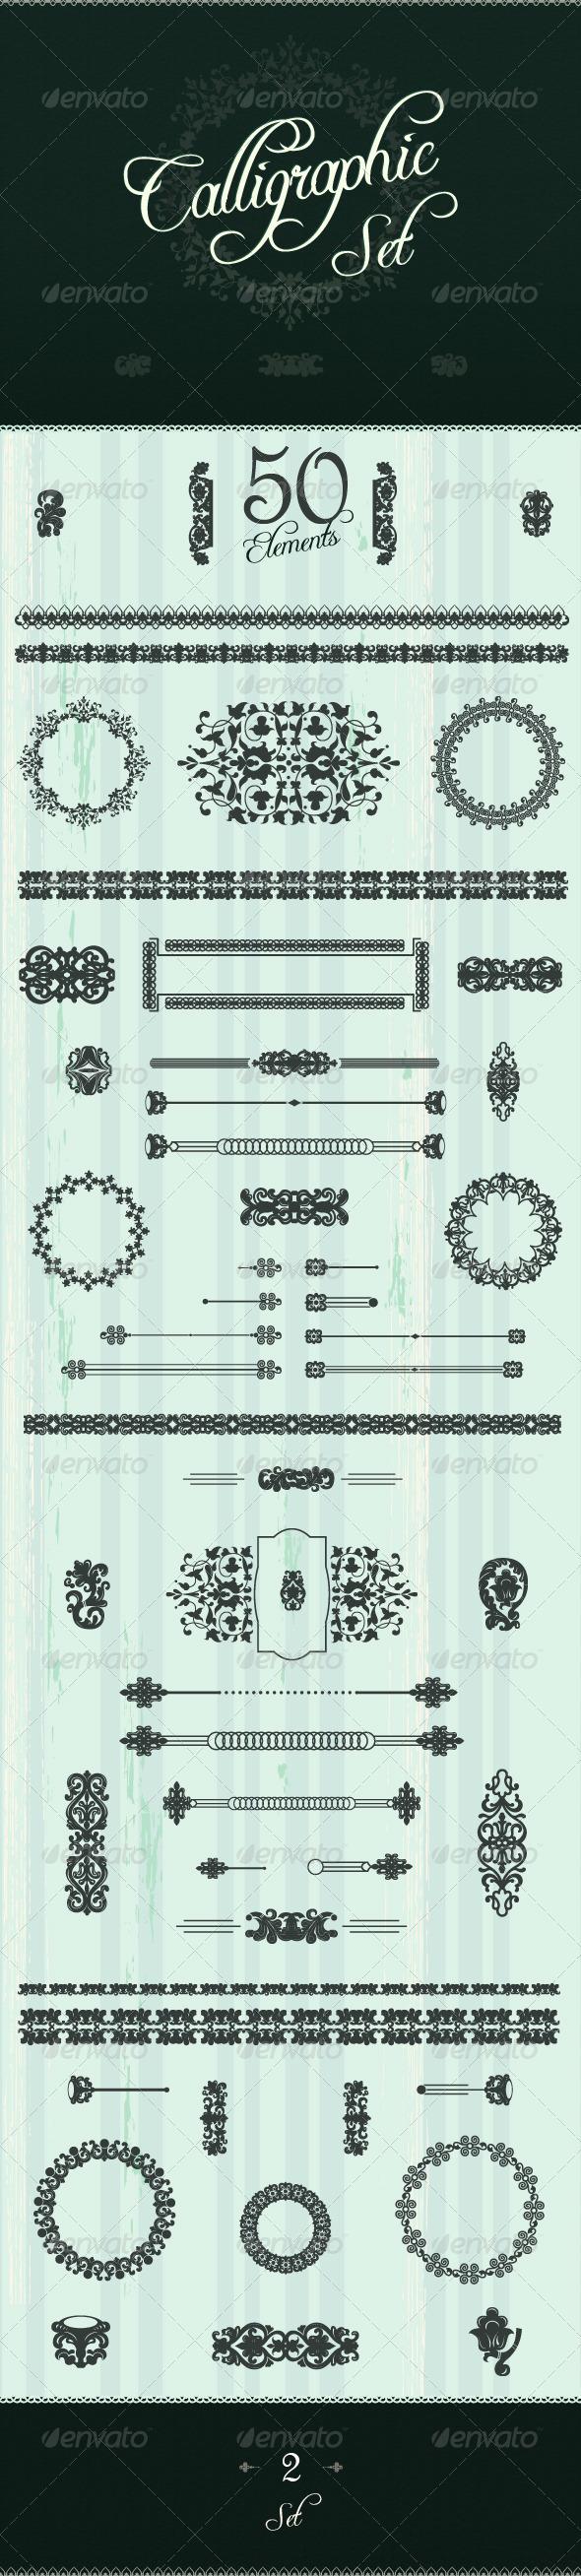 GraphicRiver Art Calligraphic Design Set 4185837